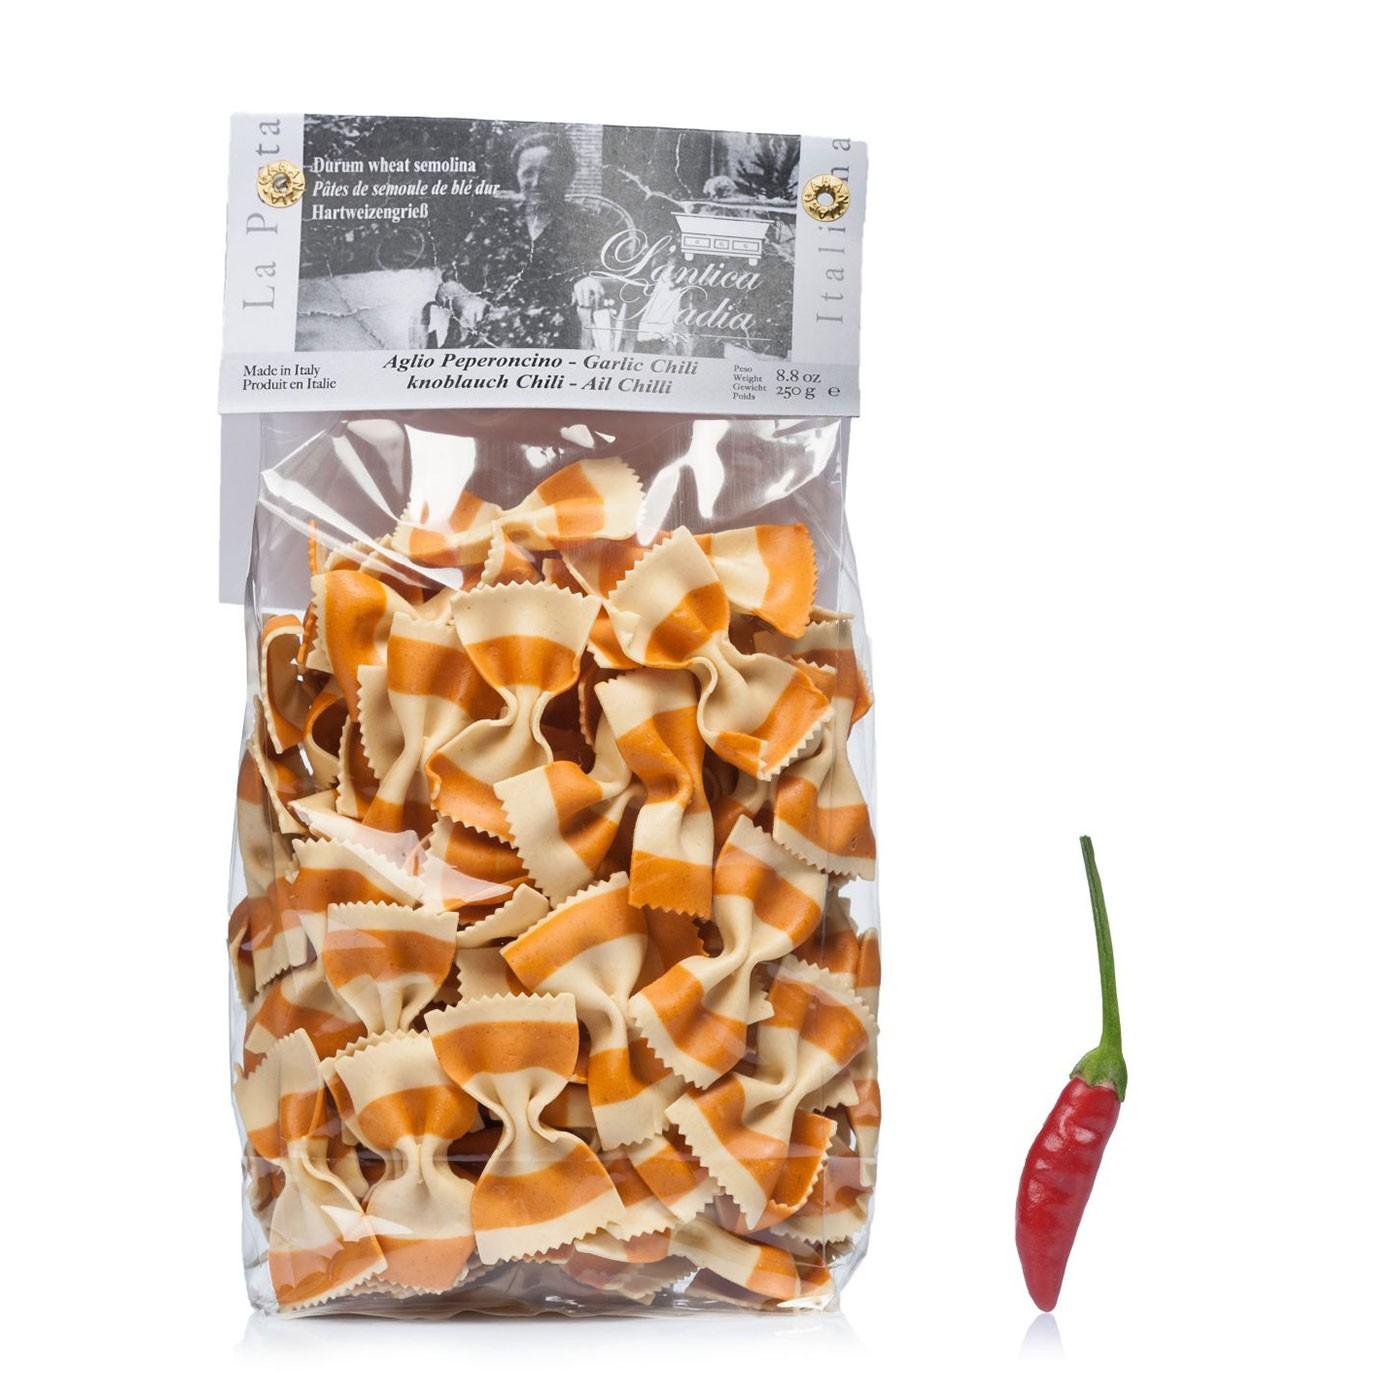 Garlic and Chili Farfalle 8.8 oz - Antica Madia